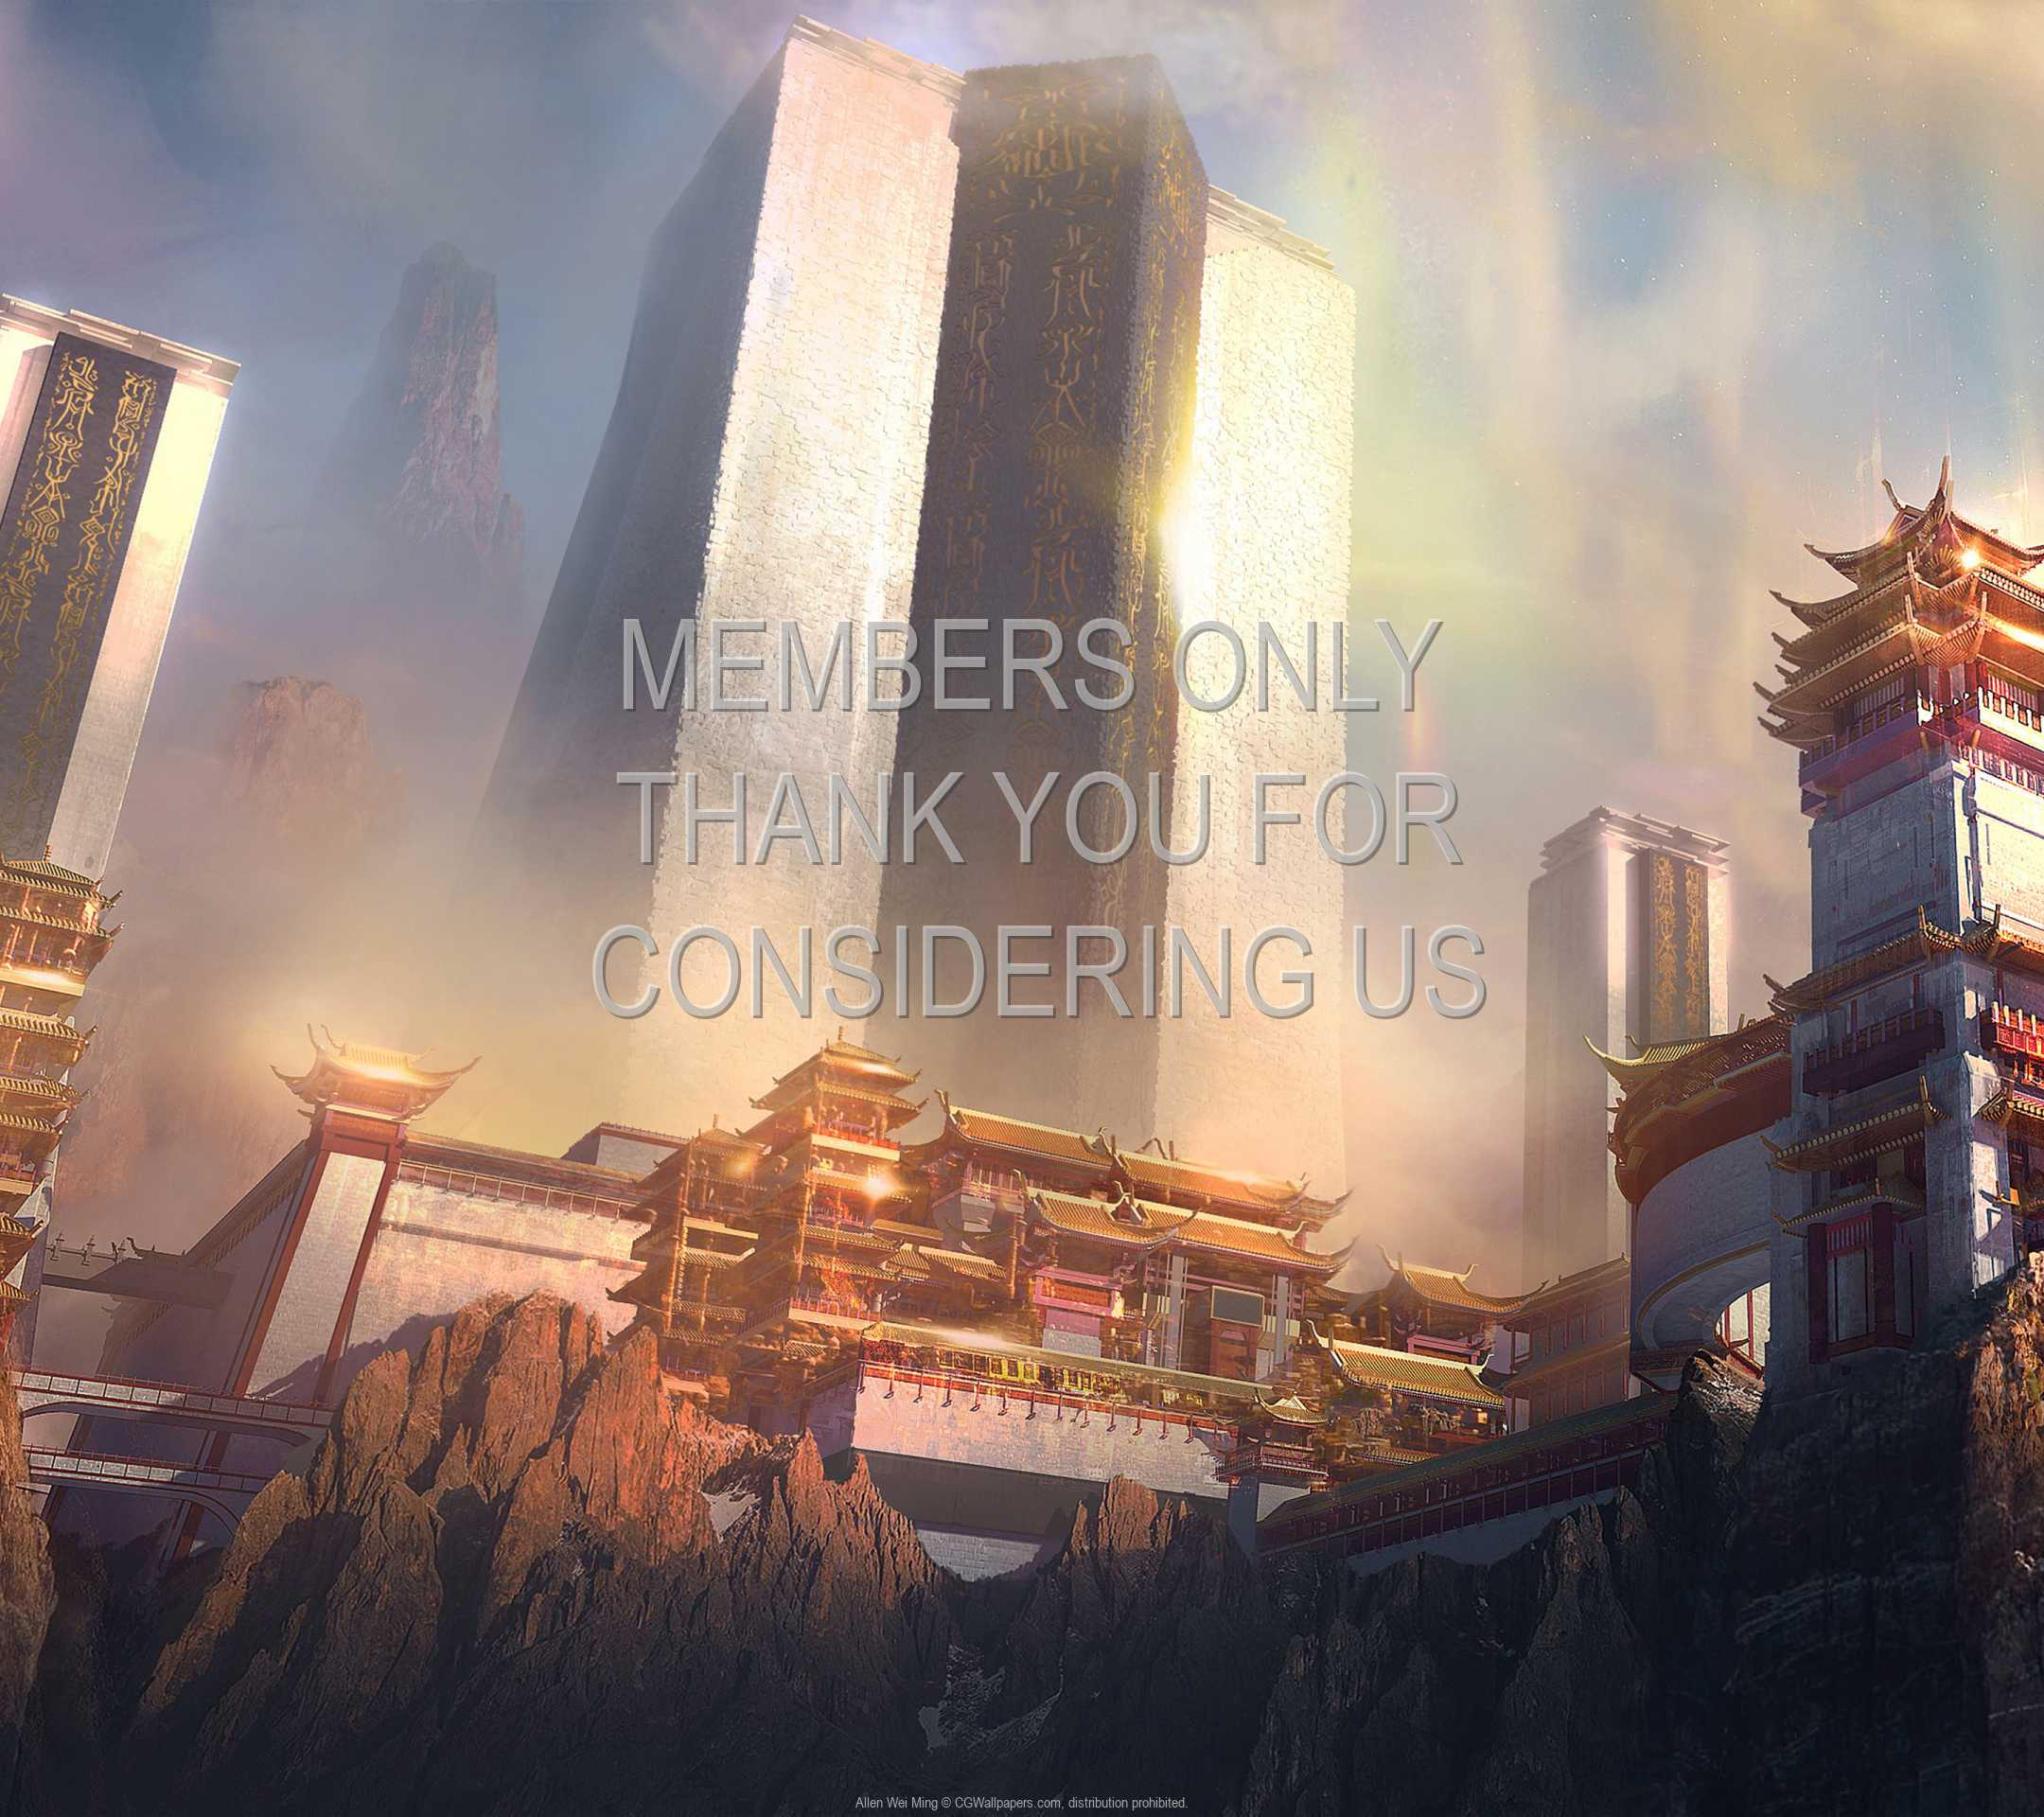 Allen Wei Ming 1080p Horizontal Móvil fondo de escritorio 15